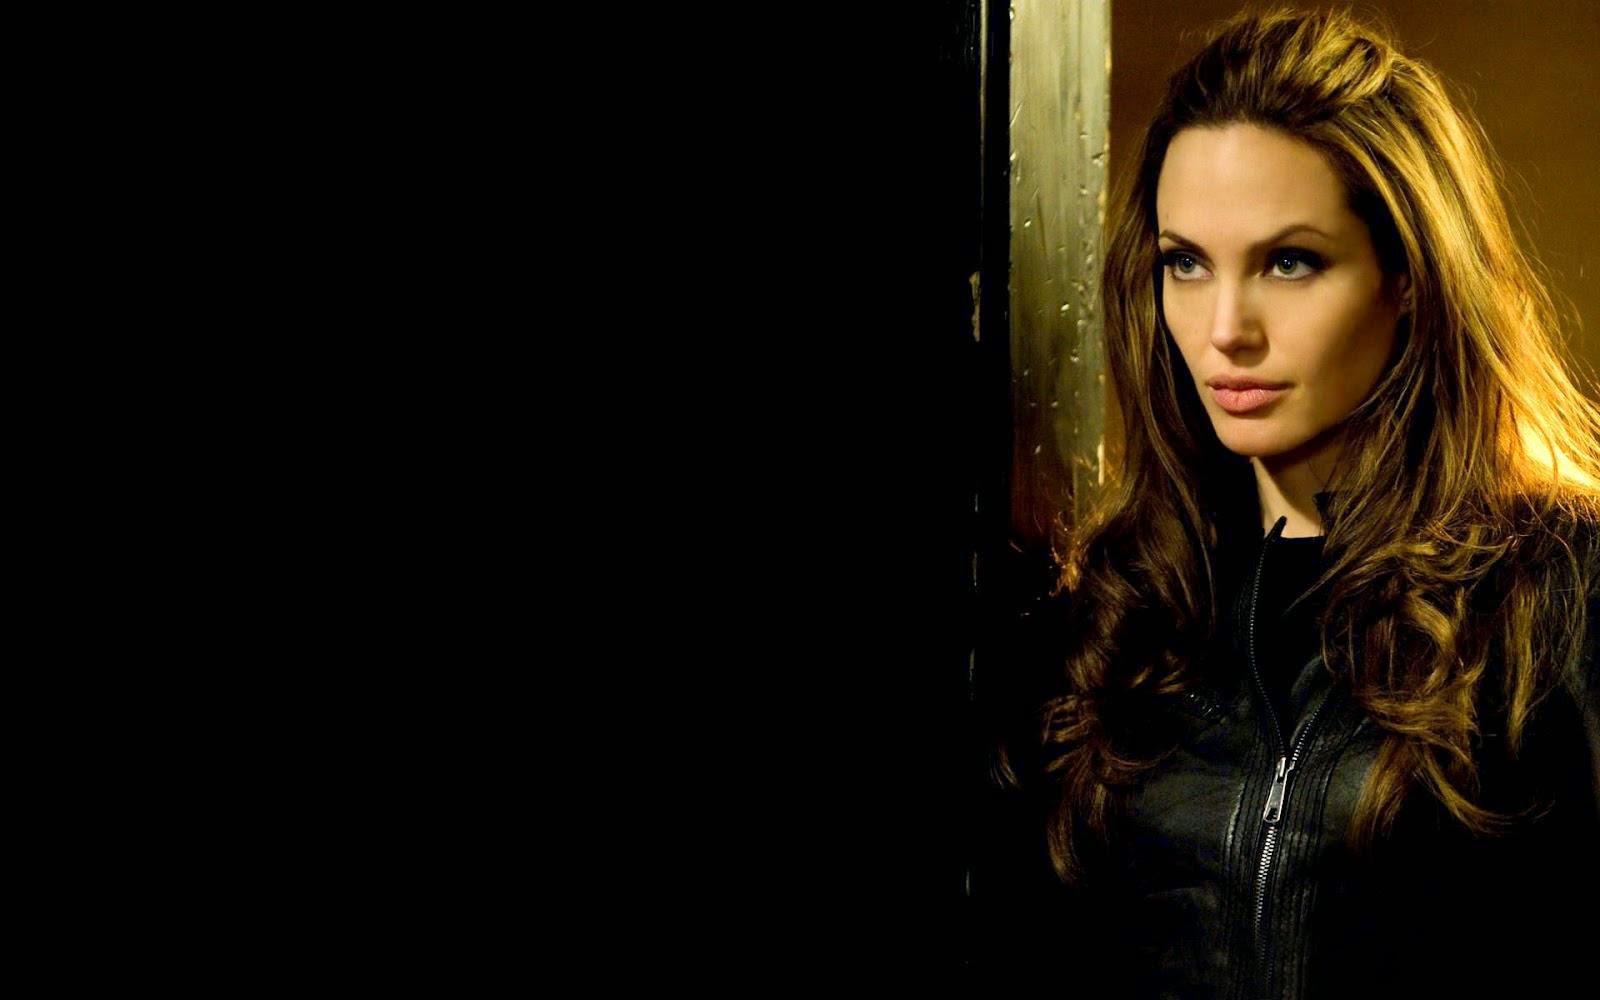 film stars world angelina jolie hd wallpaper 1080p